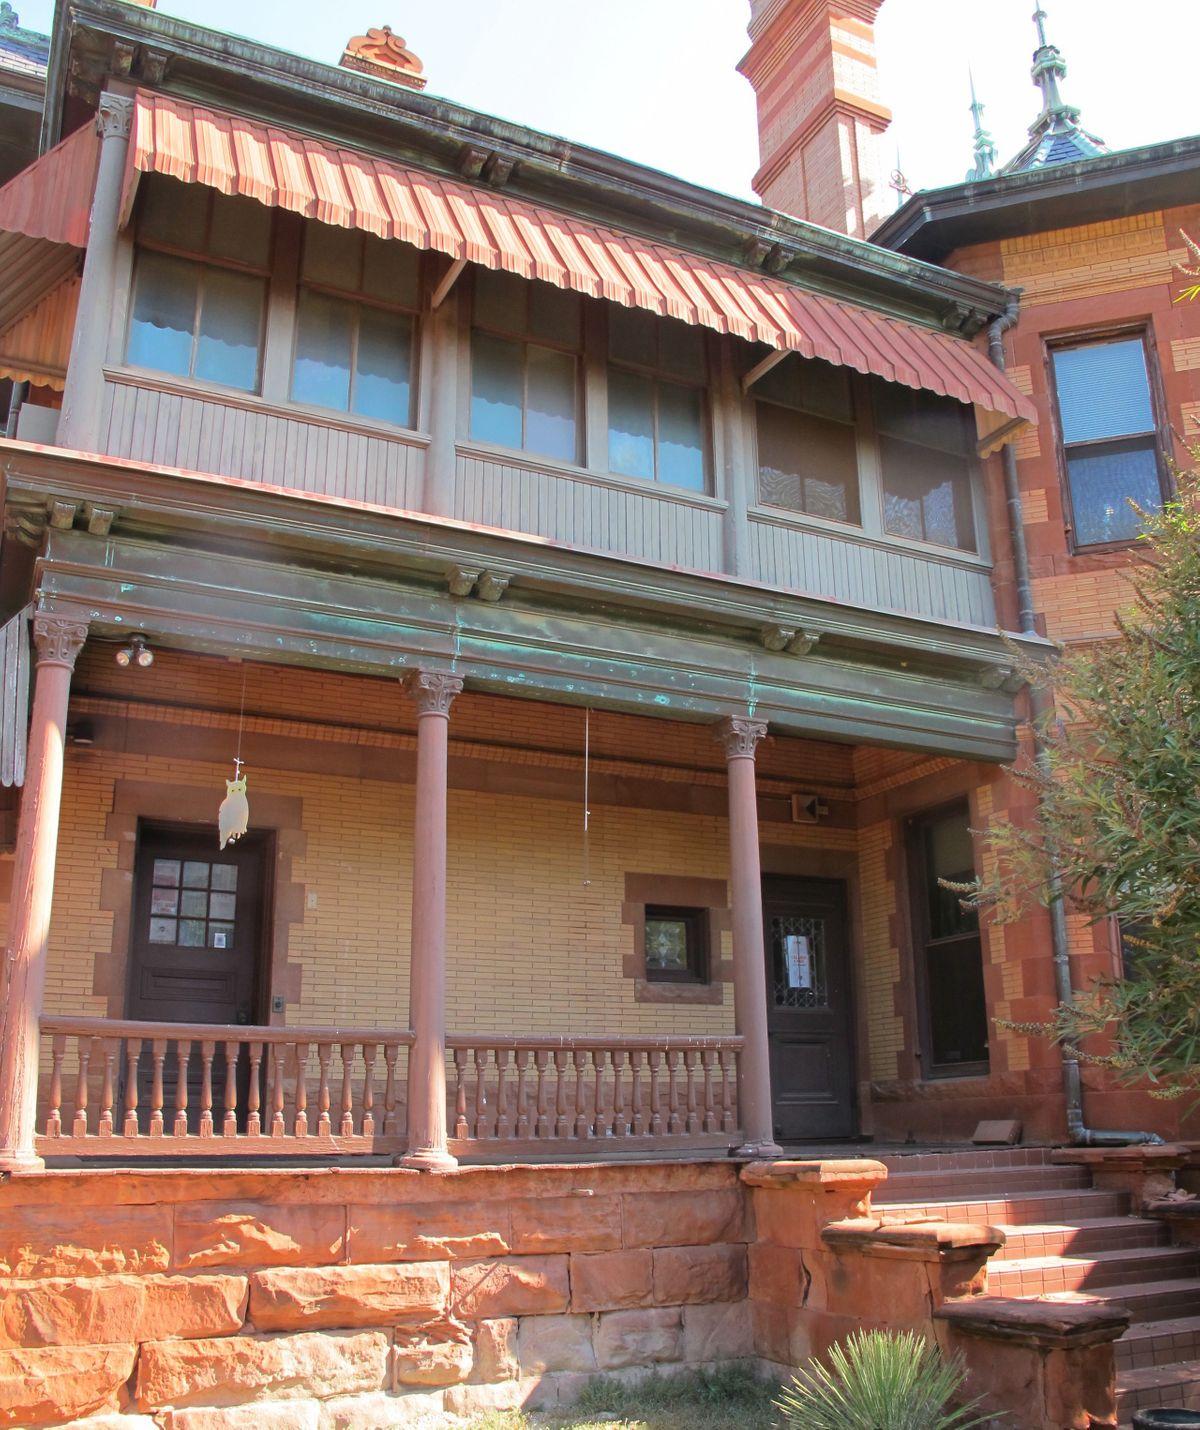 McFarland Historical Home Photo Video Shoot Location Dallas 08.jpg